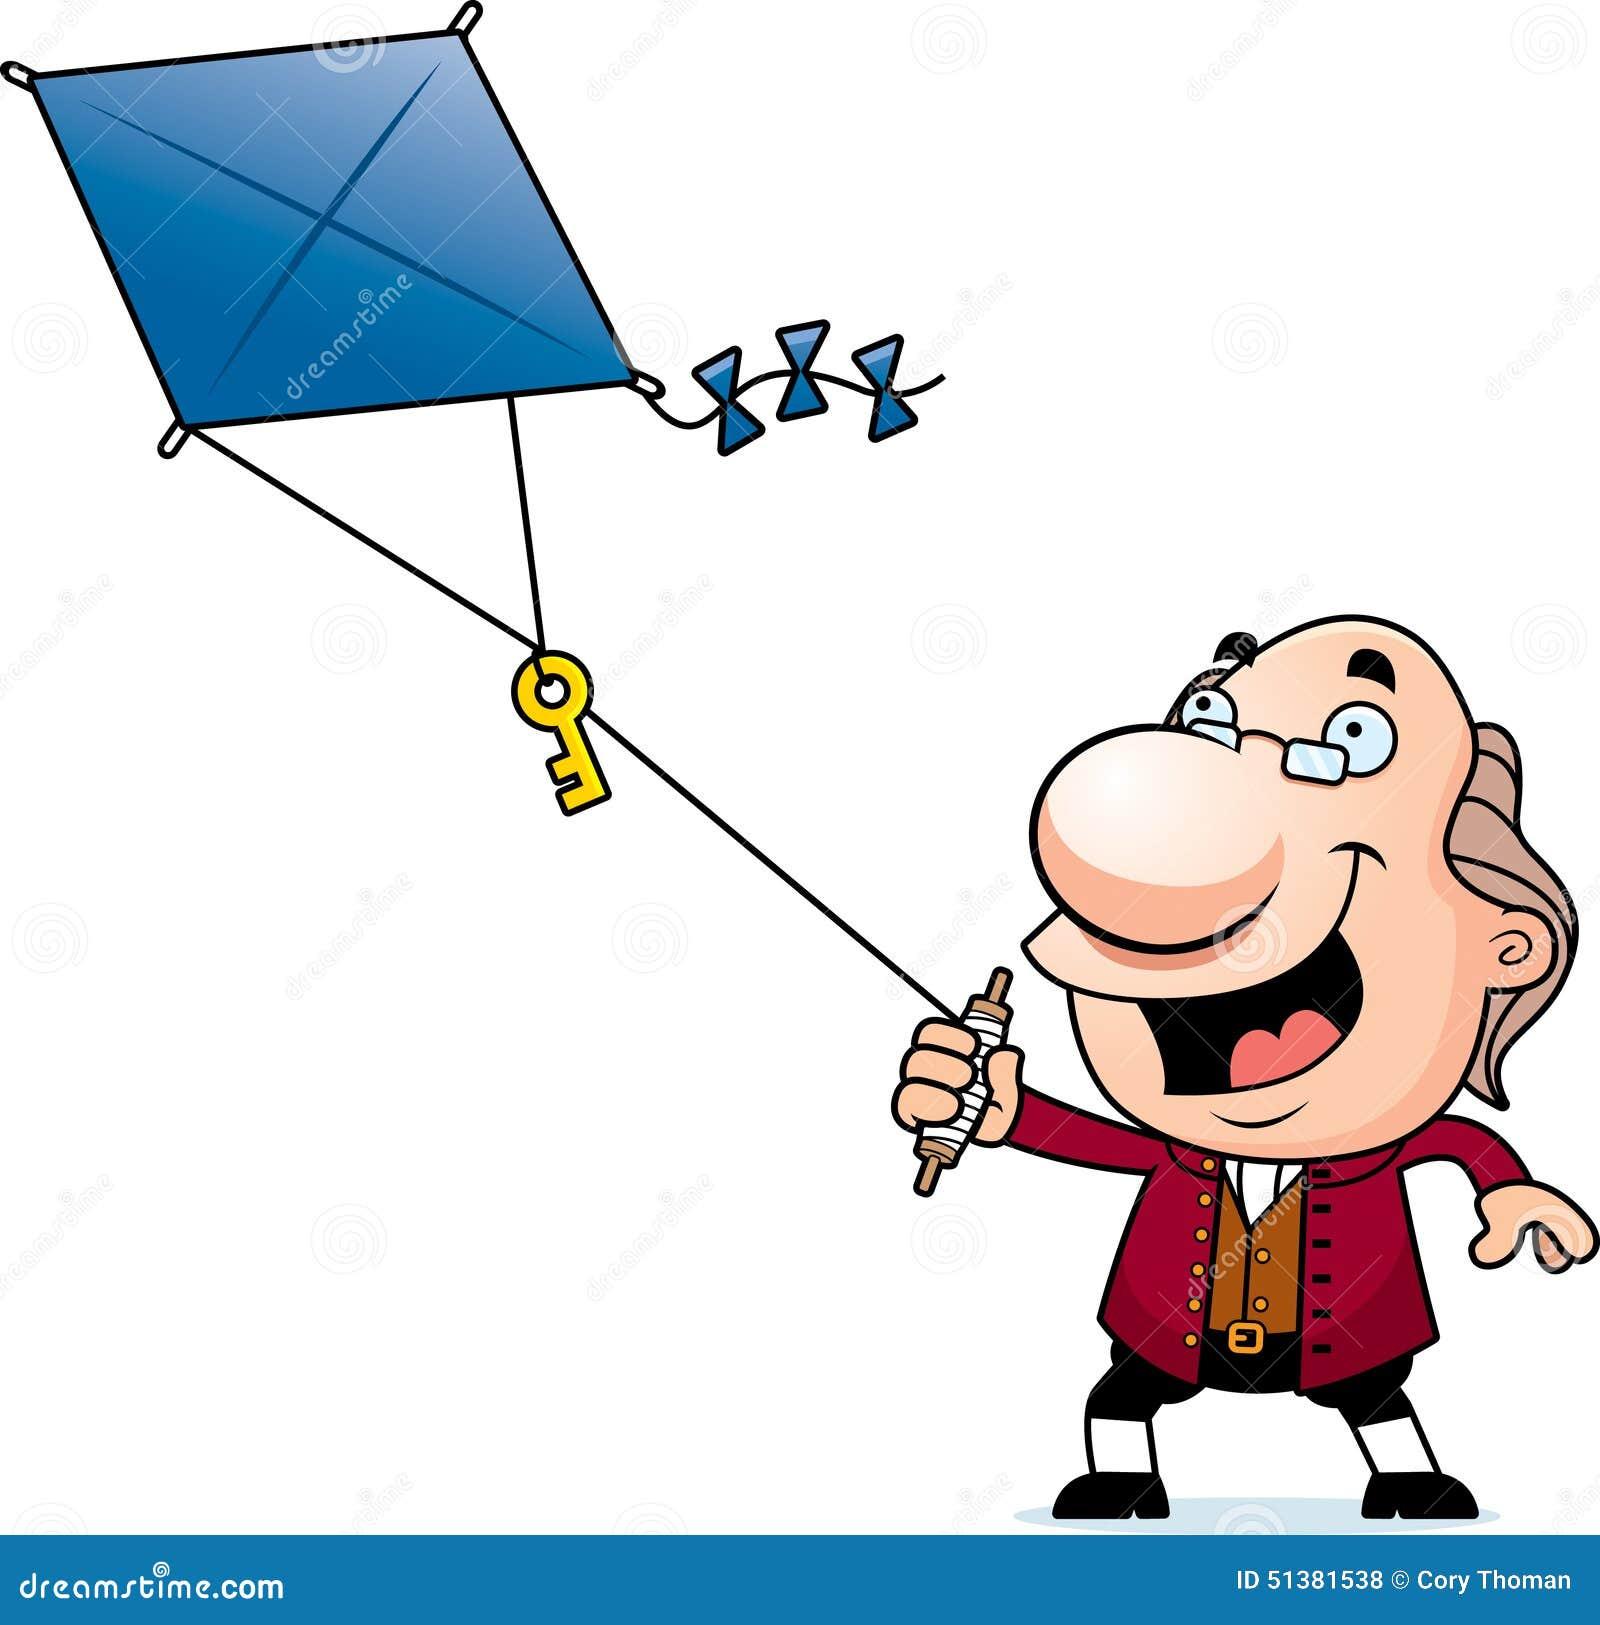 Uncategorized Cartoon Franklin cartoon ben franklin kite stock vector image of glasses 51381538 kite